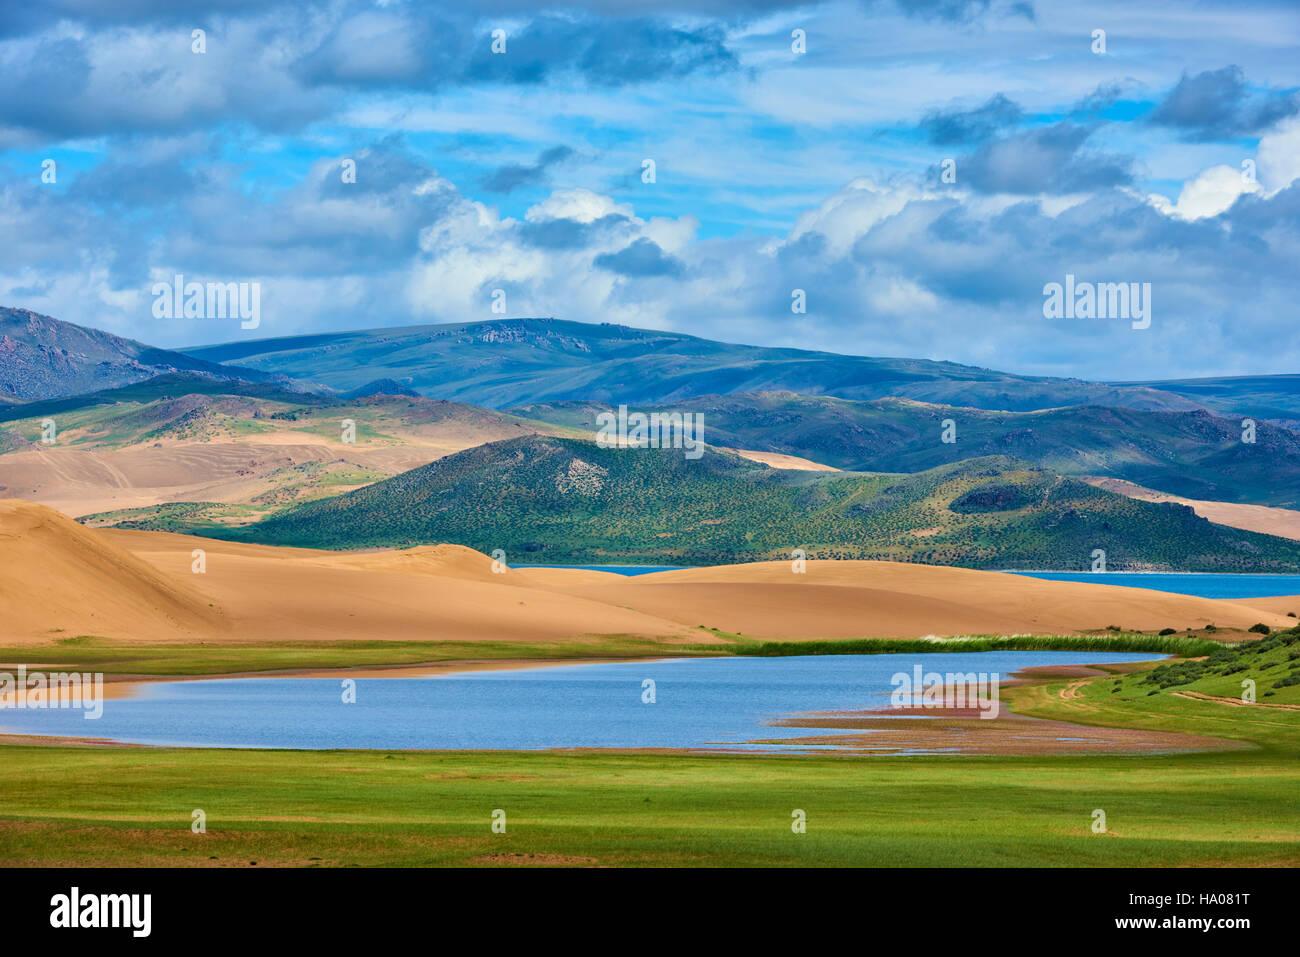 Mongolia, Zavkhan provincia, Har Nuur lake Immagini Stock